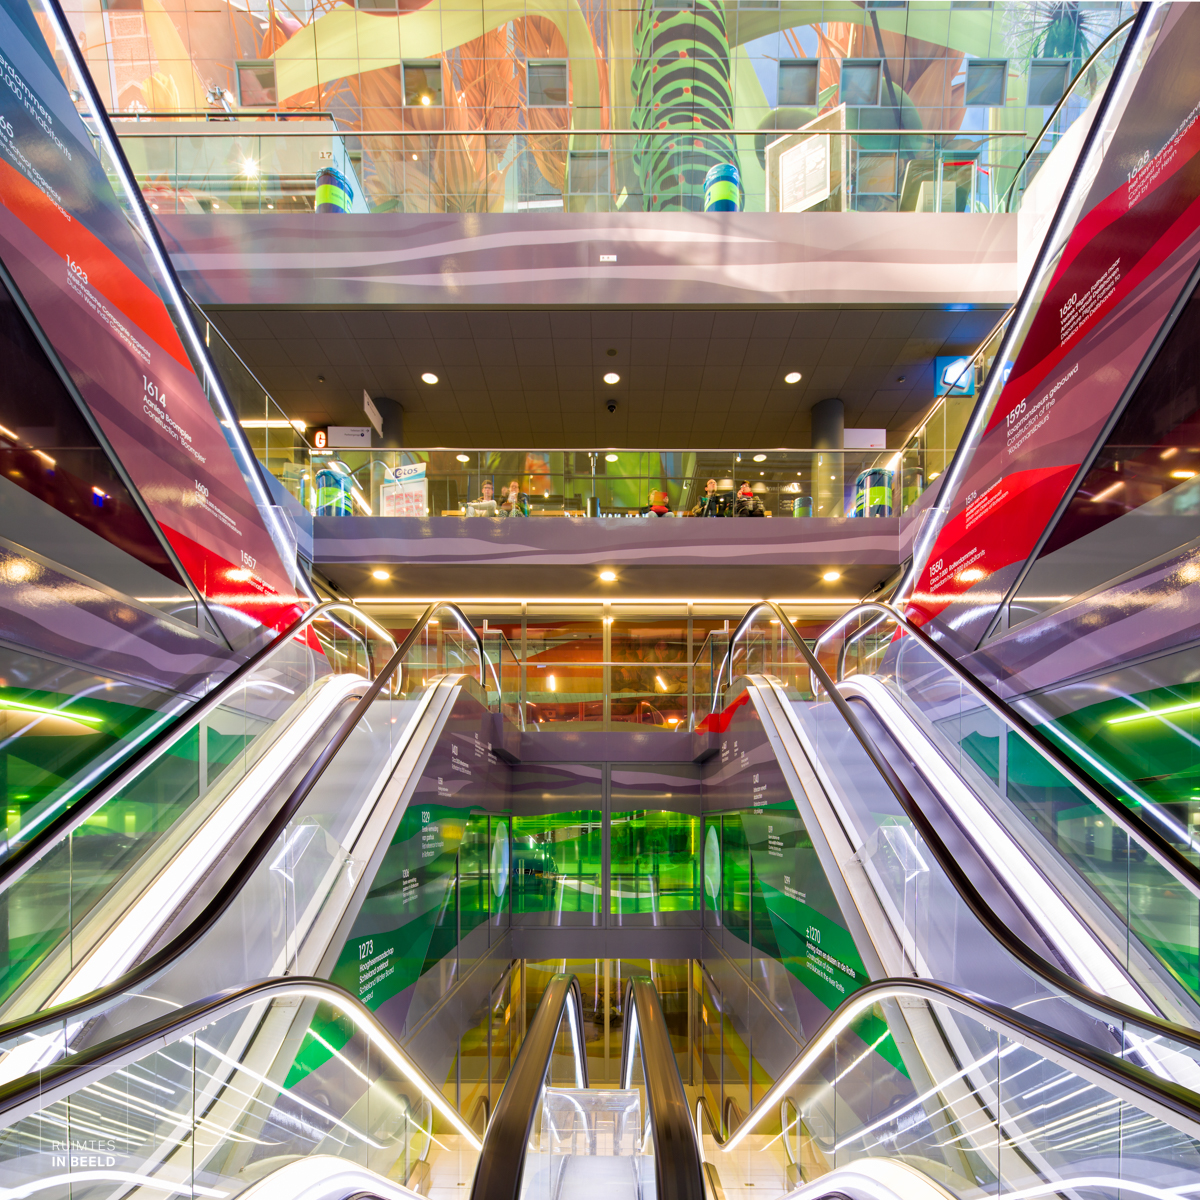 Kleurrijk en symmetrisch interieur van de Markthal in Rotterdam | Colorful and symmetrical interior of the Markthal in Rotterdam, Netherlands